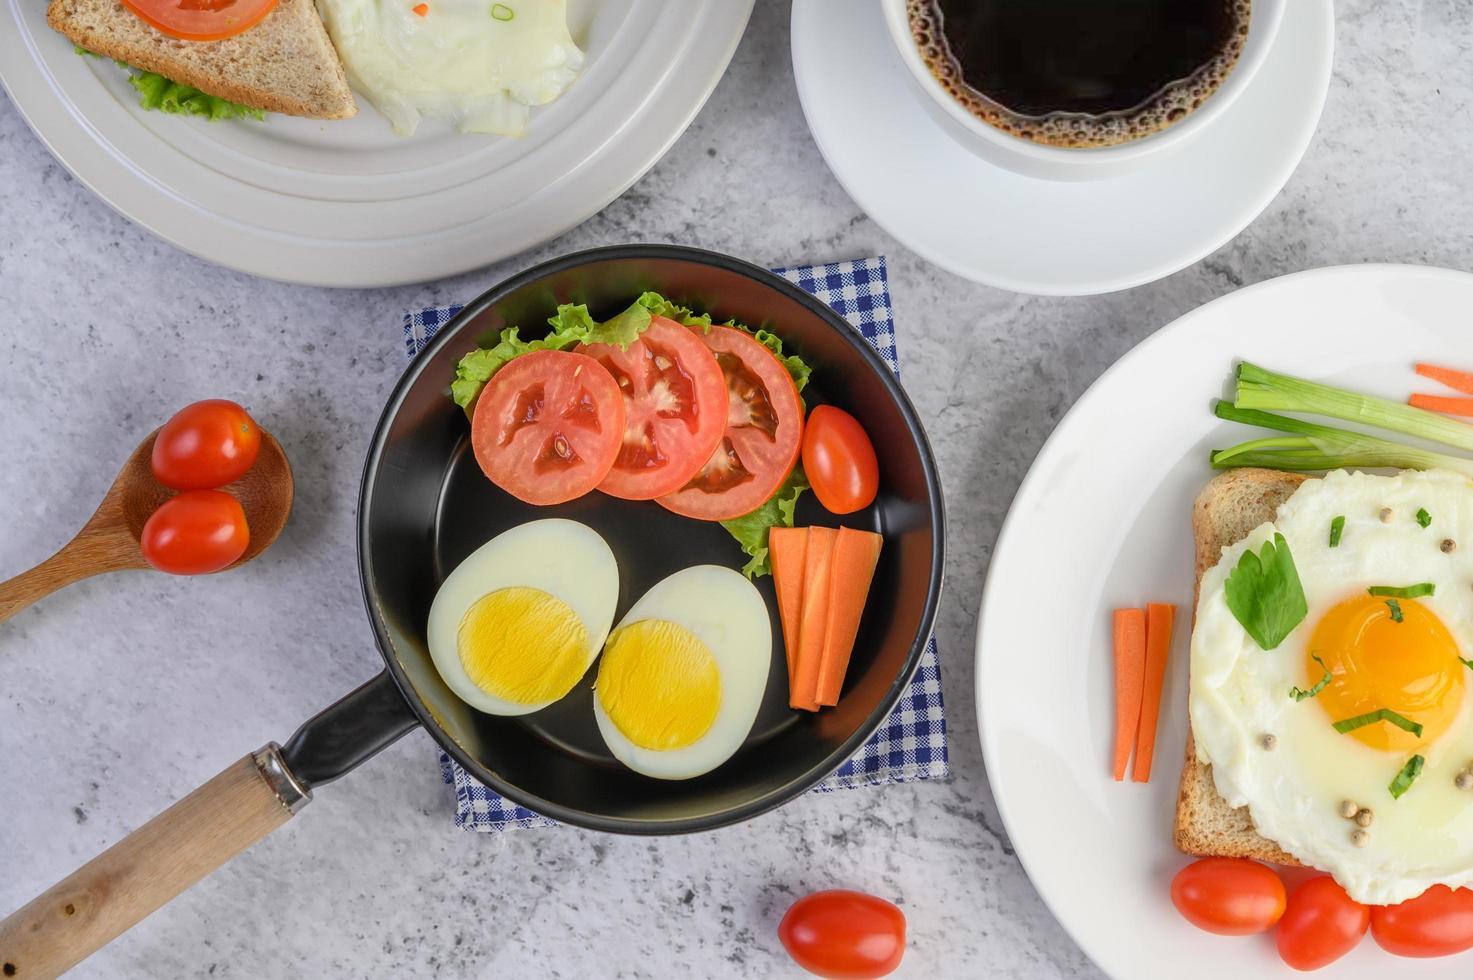 gekookte eieren, wortelen en tomaten met lepel en koffiekopje foto